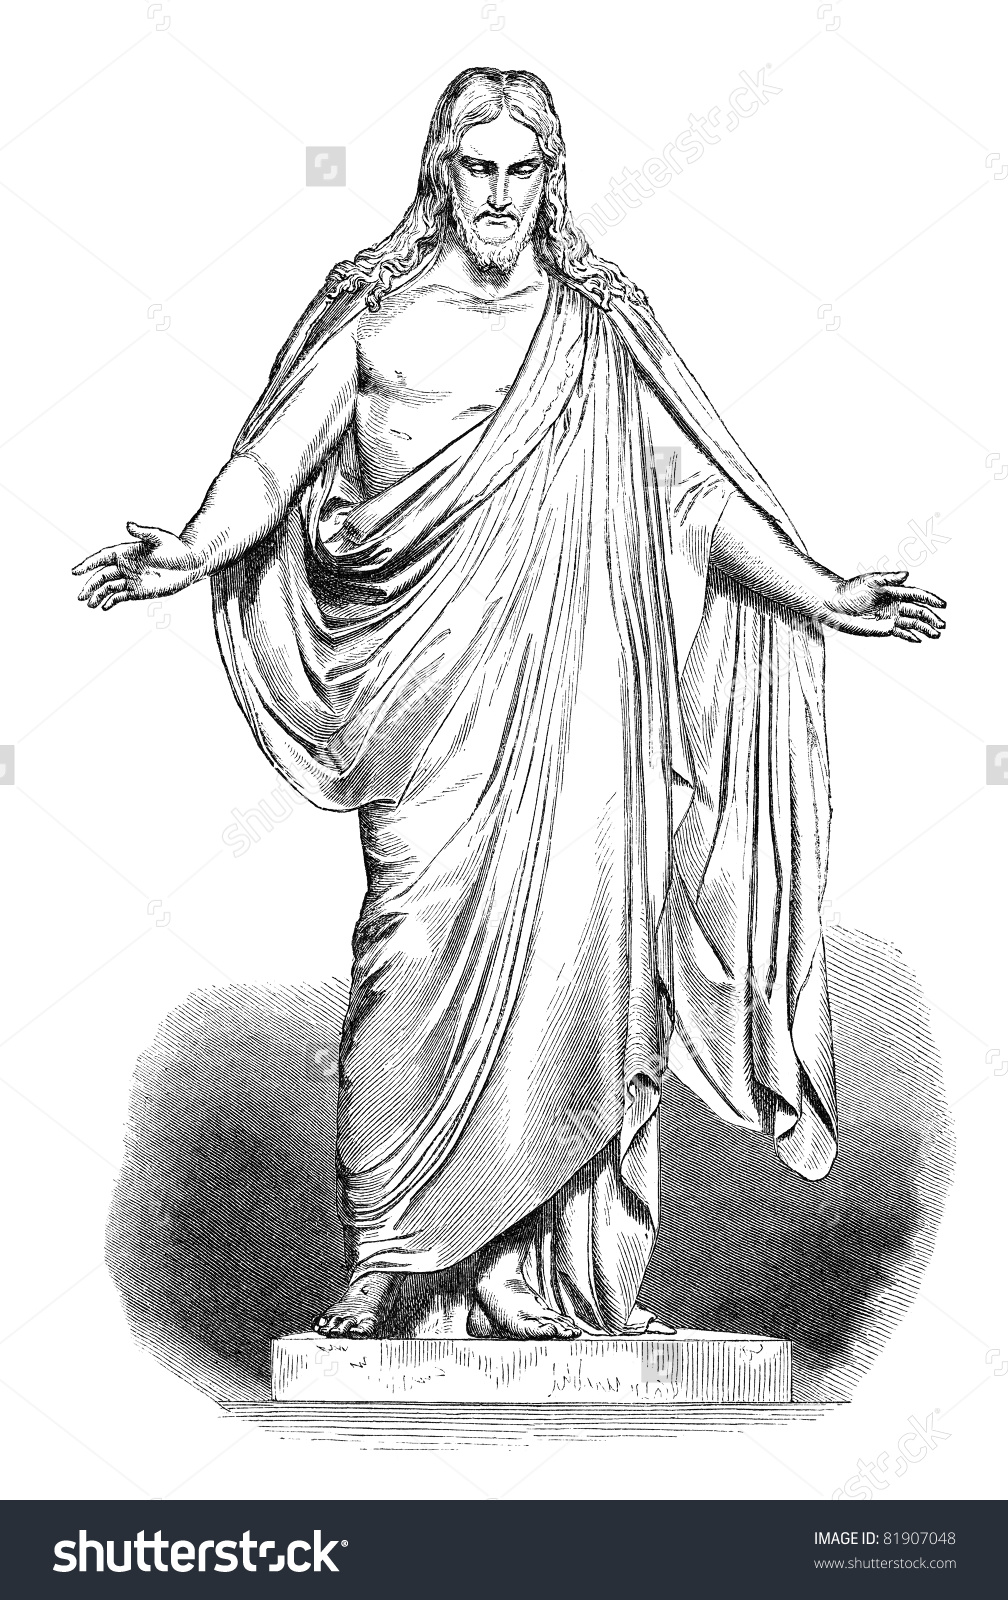 Illustration Jesus Based On Thorvaldsens Christus Stock Photo.